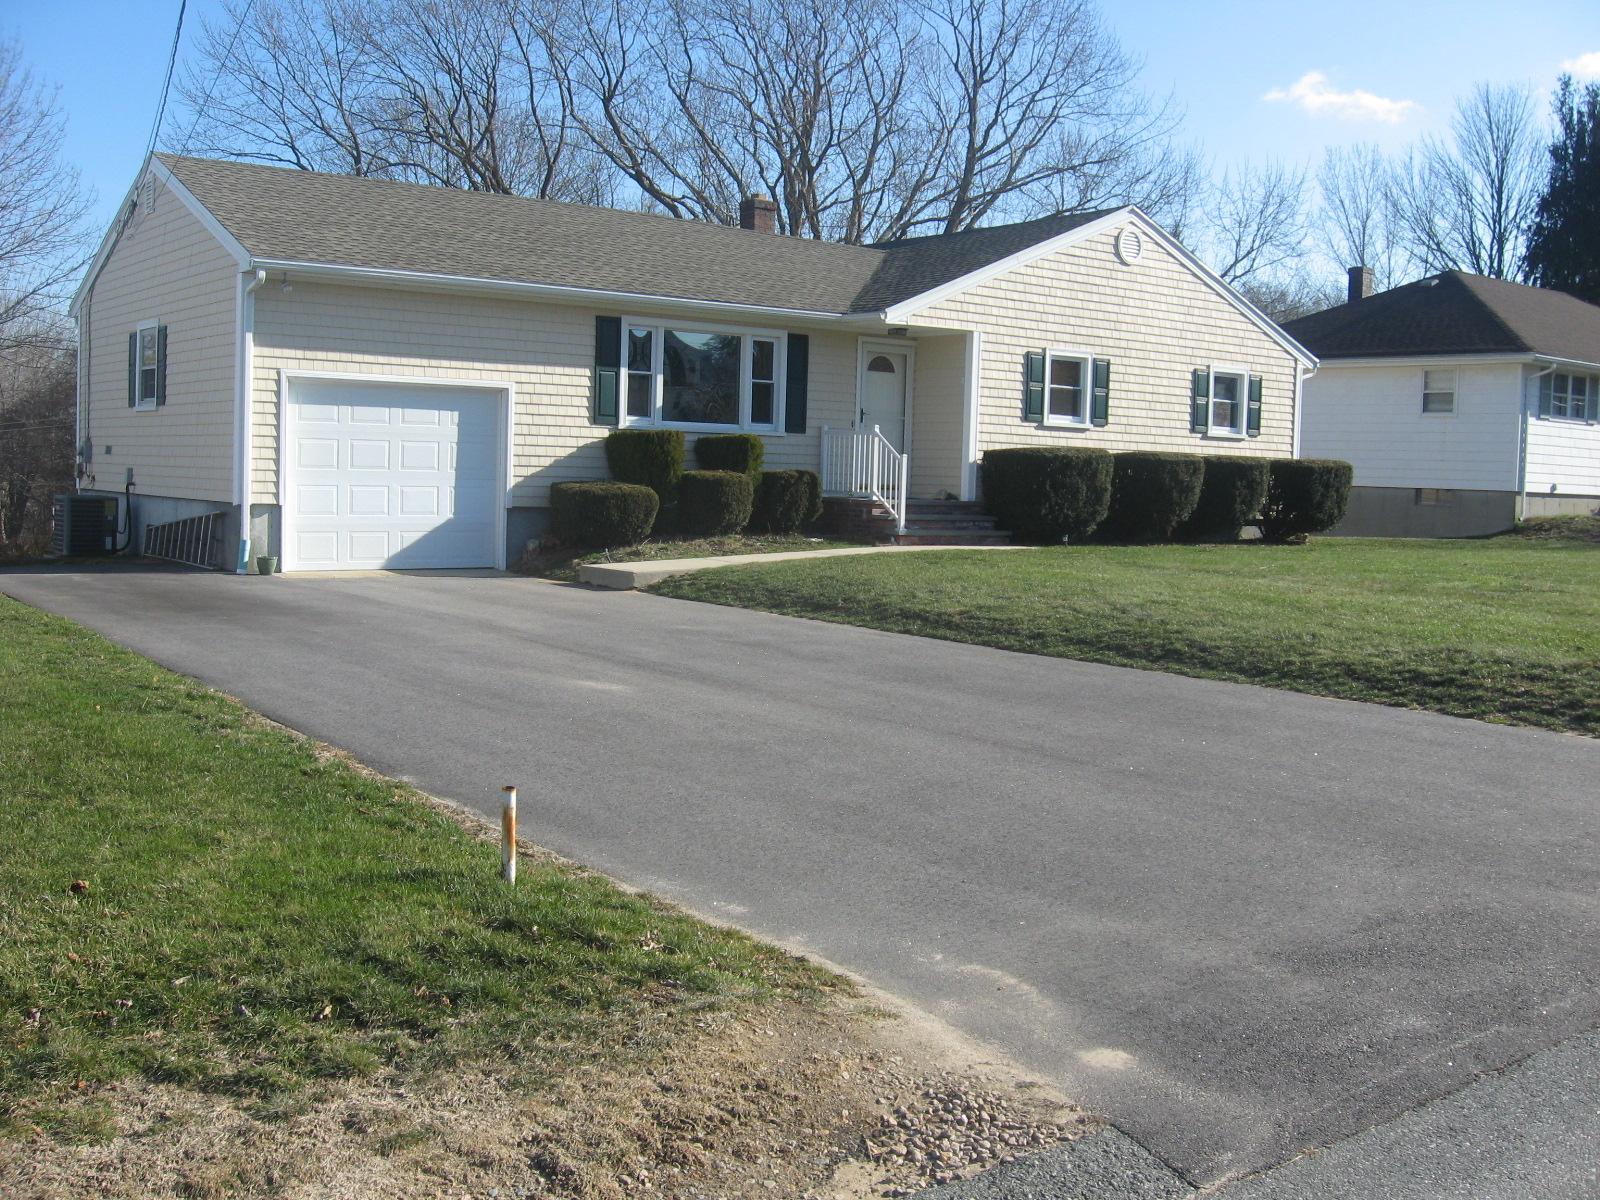 16 Nutmeg Drive, Westerly, Rhode Island 02891